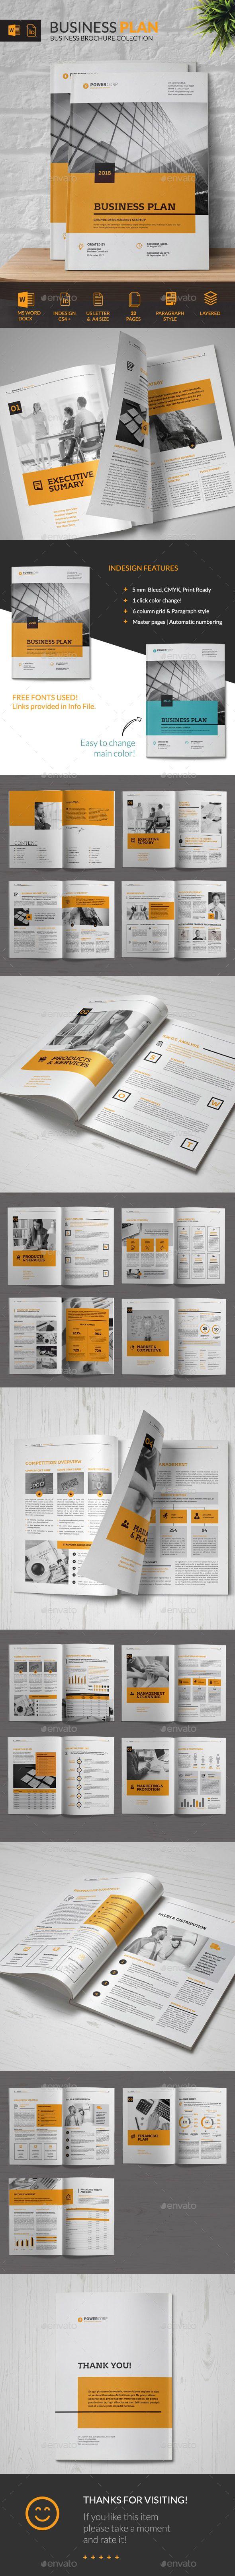 Business Plan Brochure Template InDesign INDD